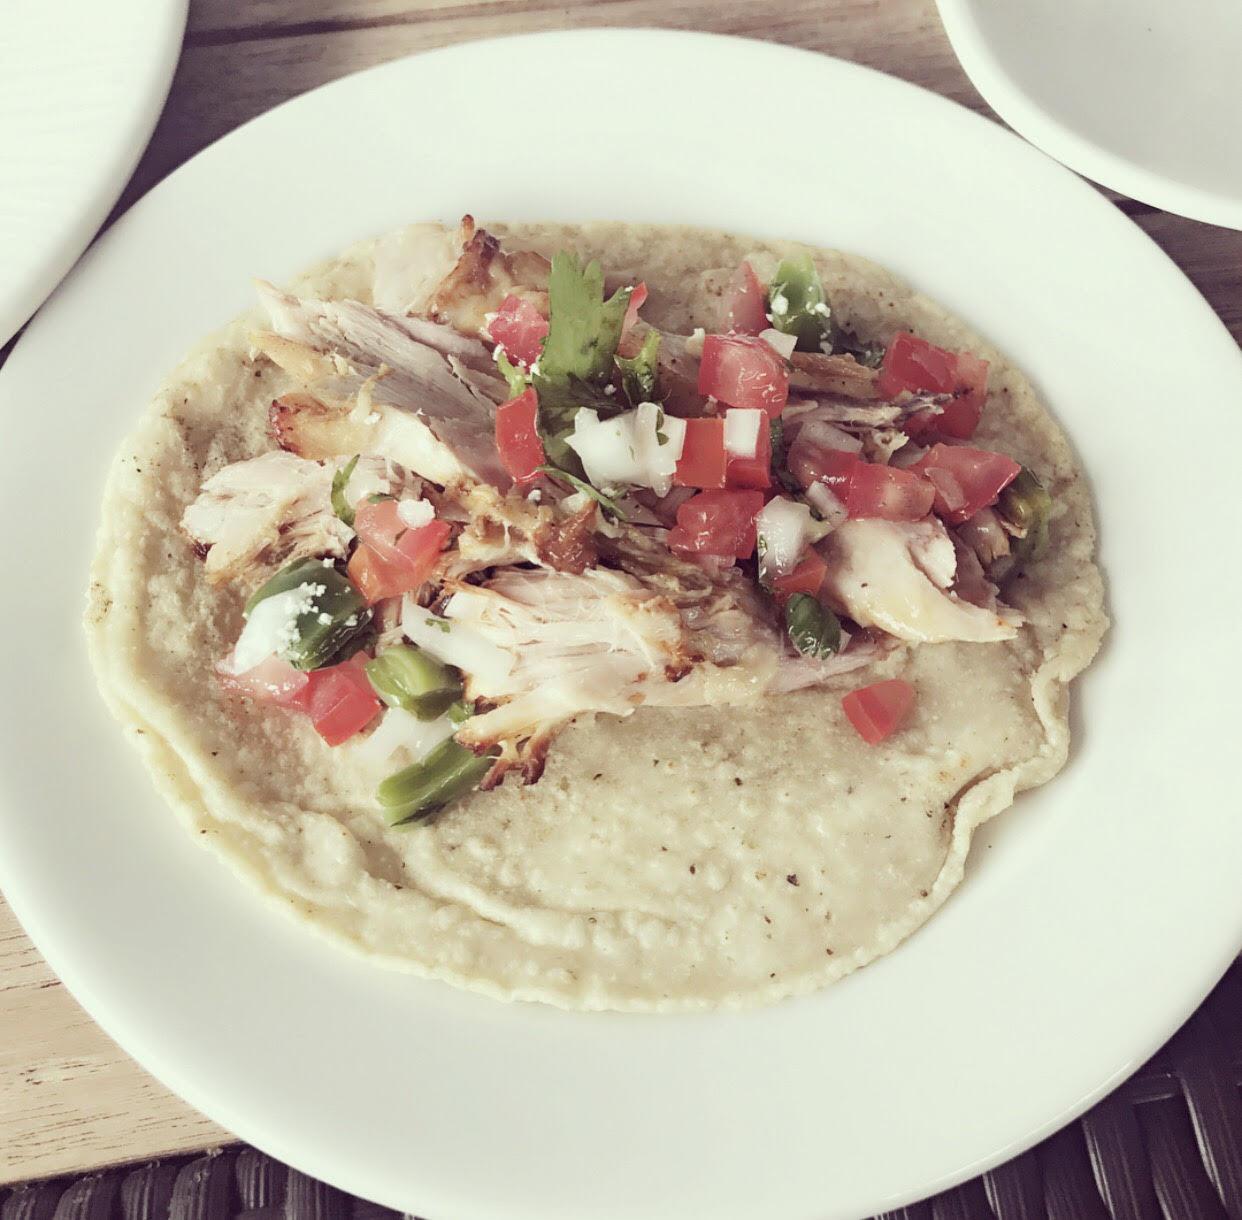 Balcon del Zocalo - Tacos de chamorro